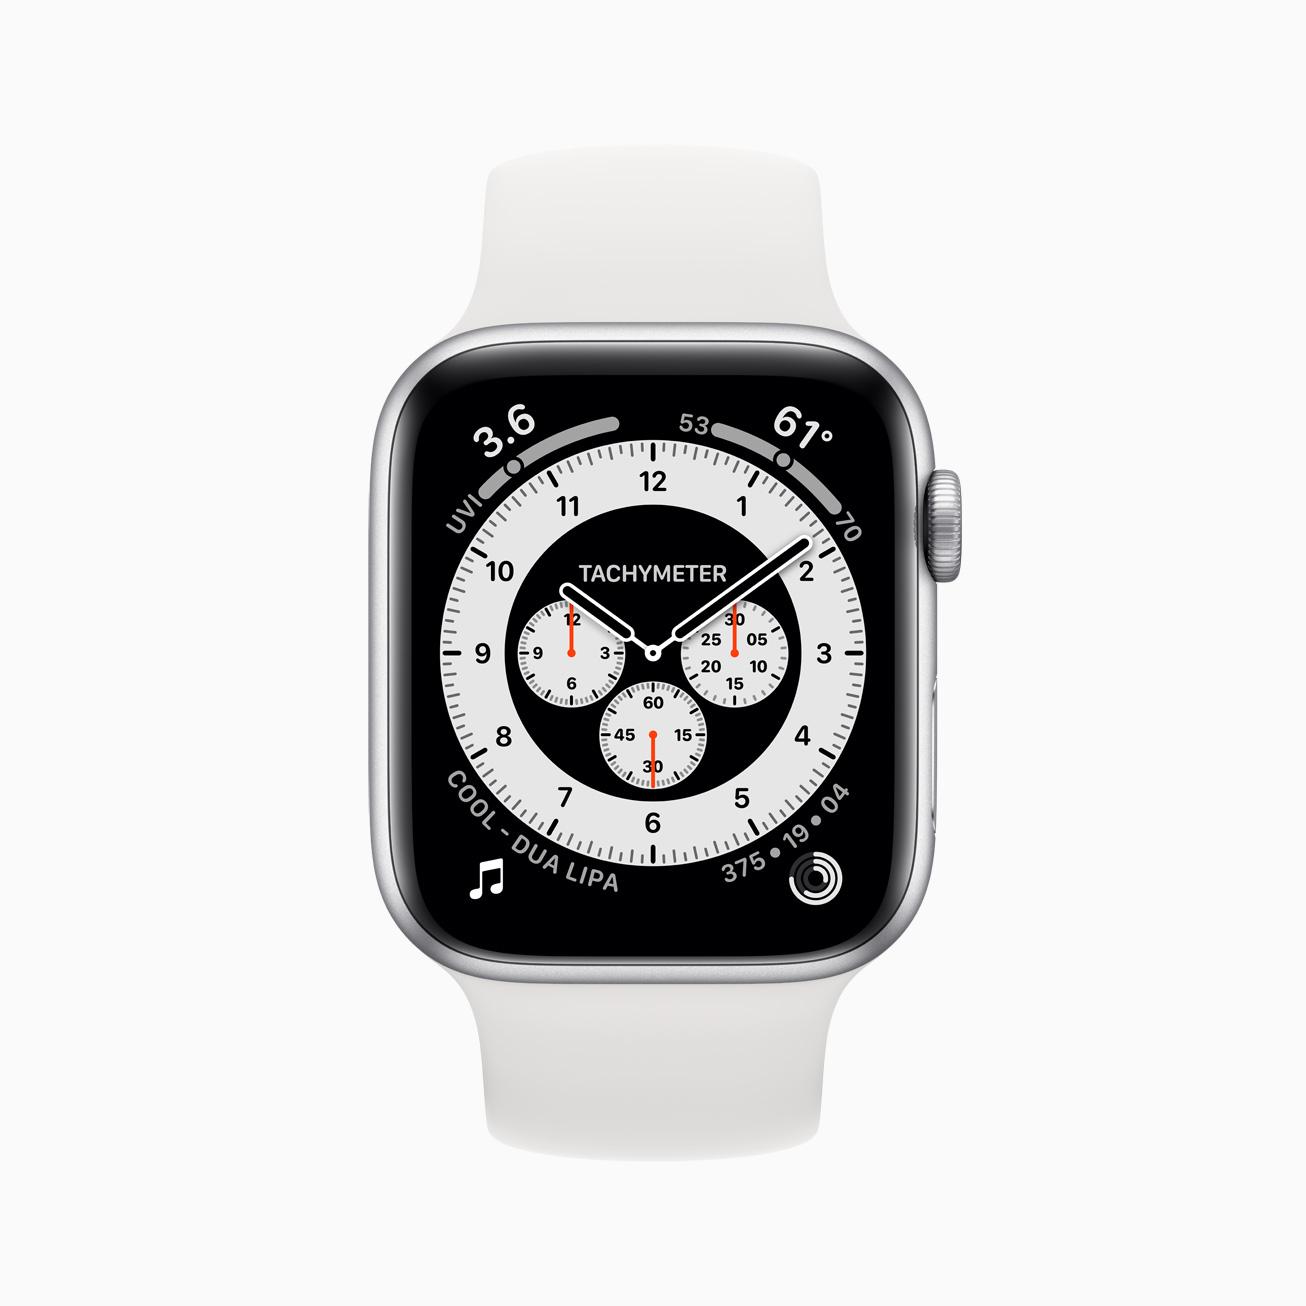 Apple Watch Series 6 prezzo